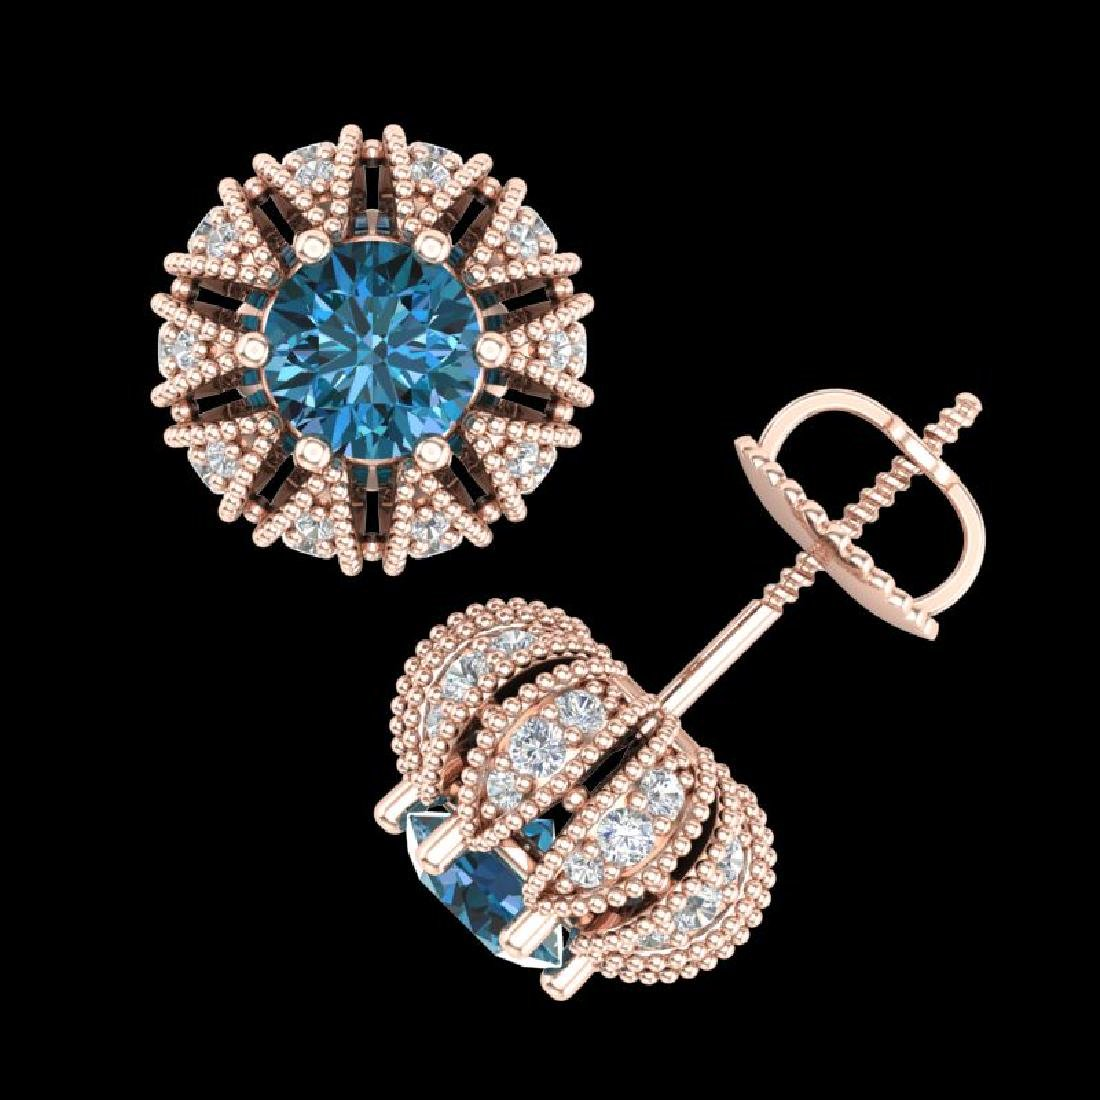 2.01 CTW Fancy Intense Blue Diamond Art Deco Stud - 3